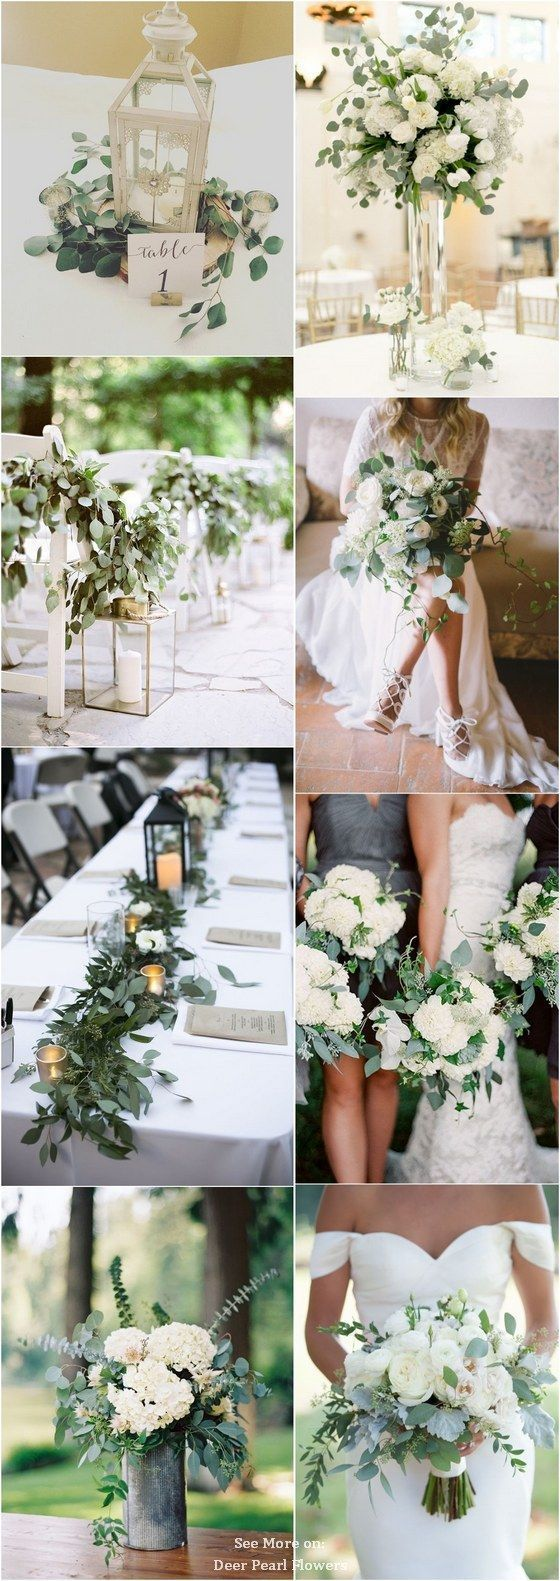 40 Greenery Eucalyptus Wedding Decor Ideas – Blume…